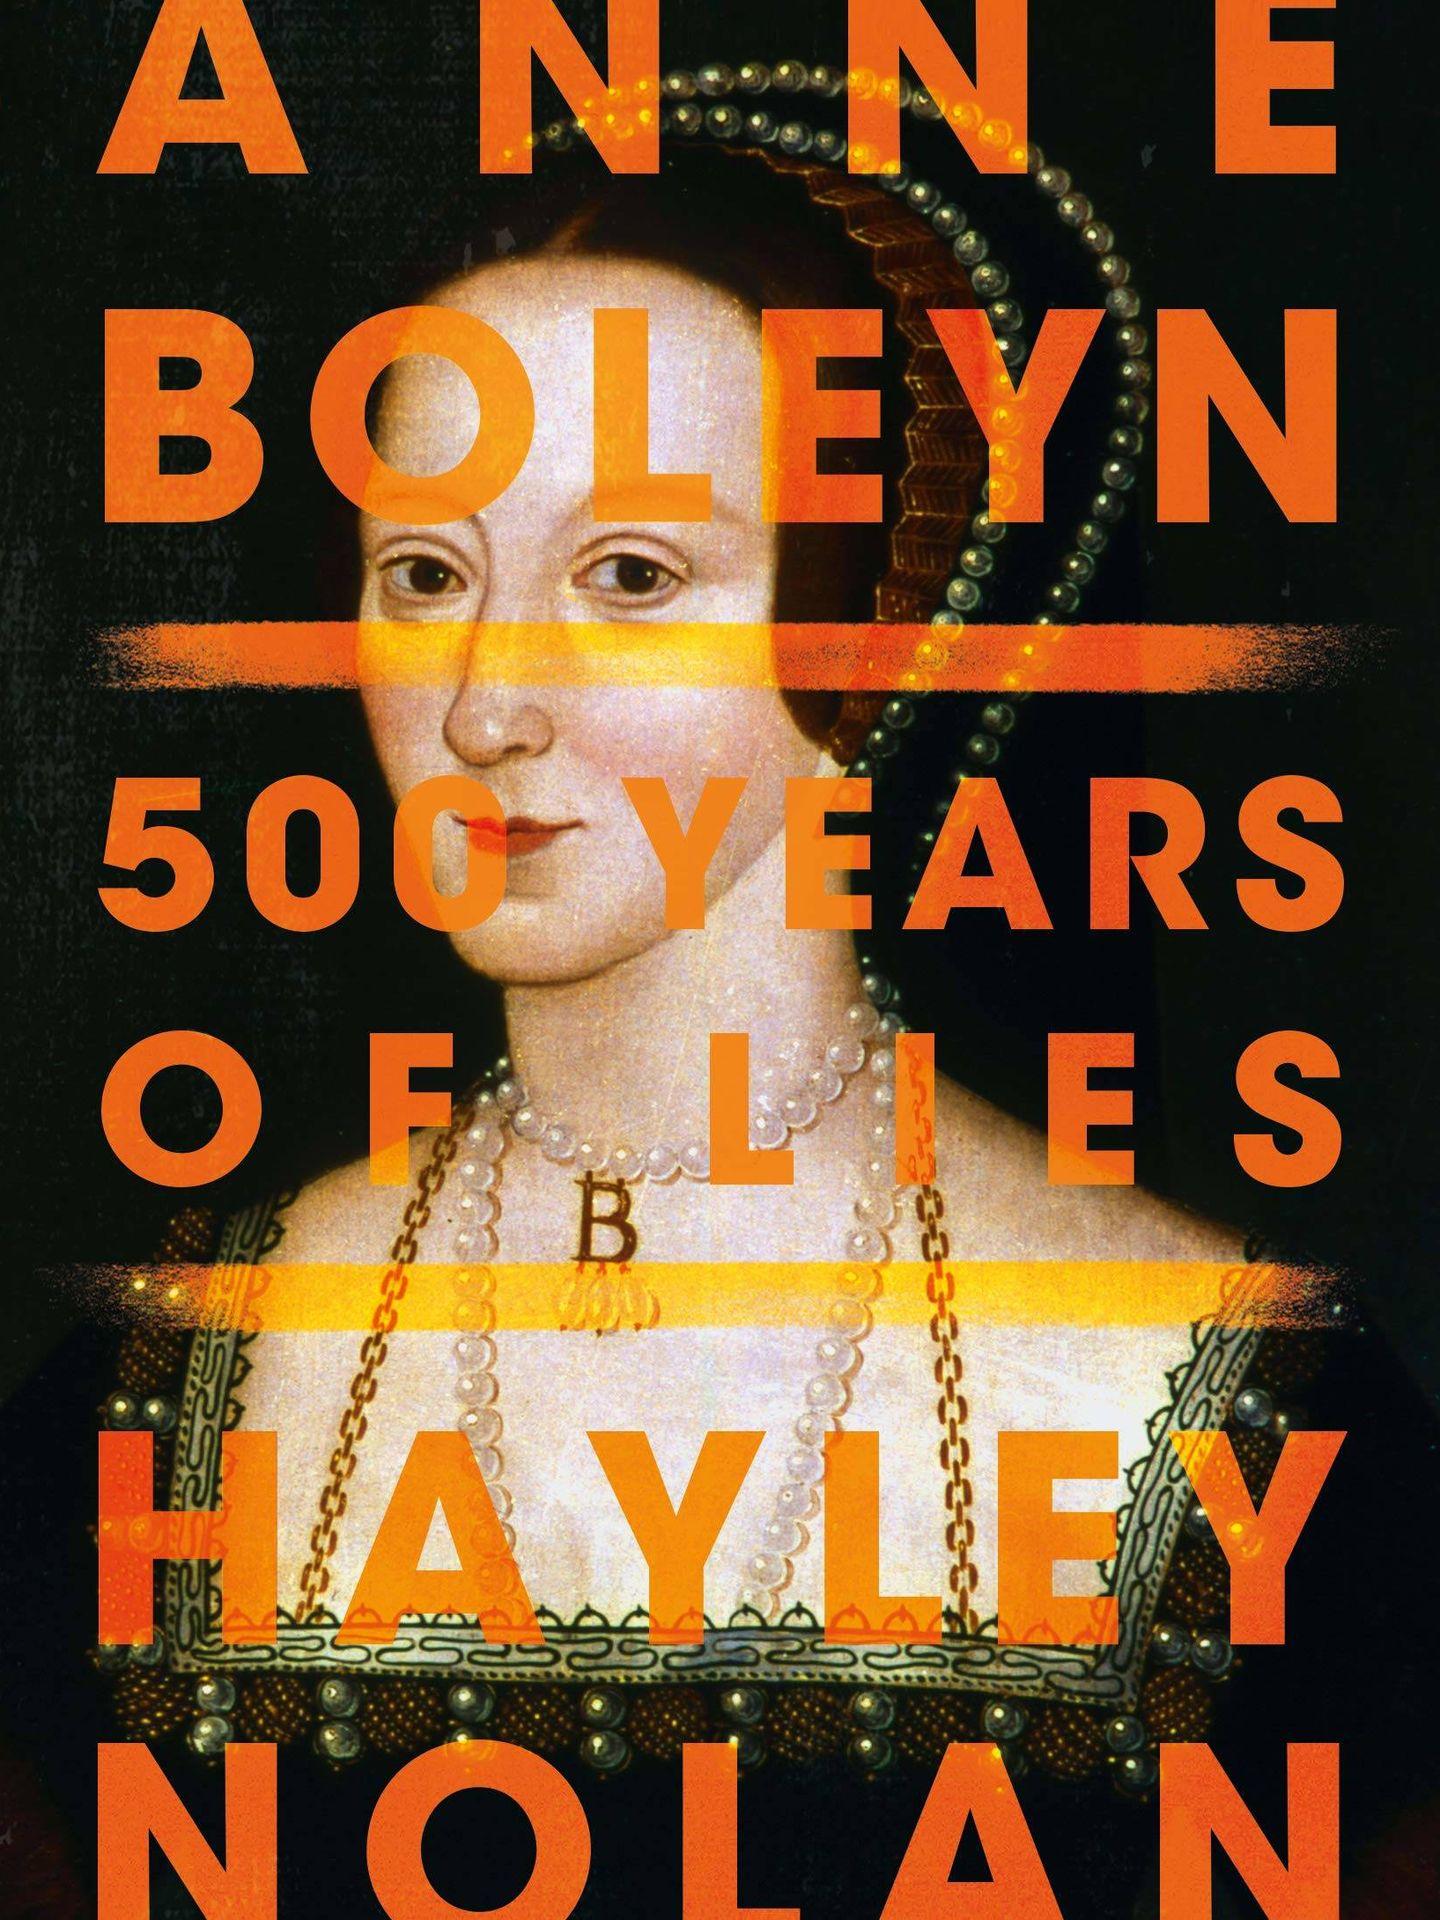 'Anne Boleyn: 500 Years of Lies'. (Amazon)